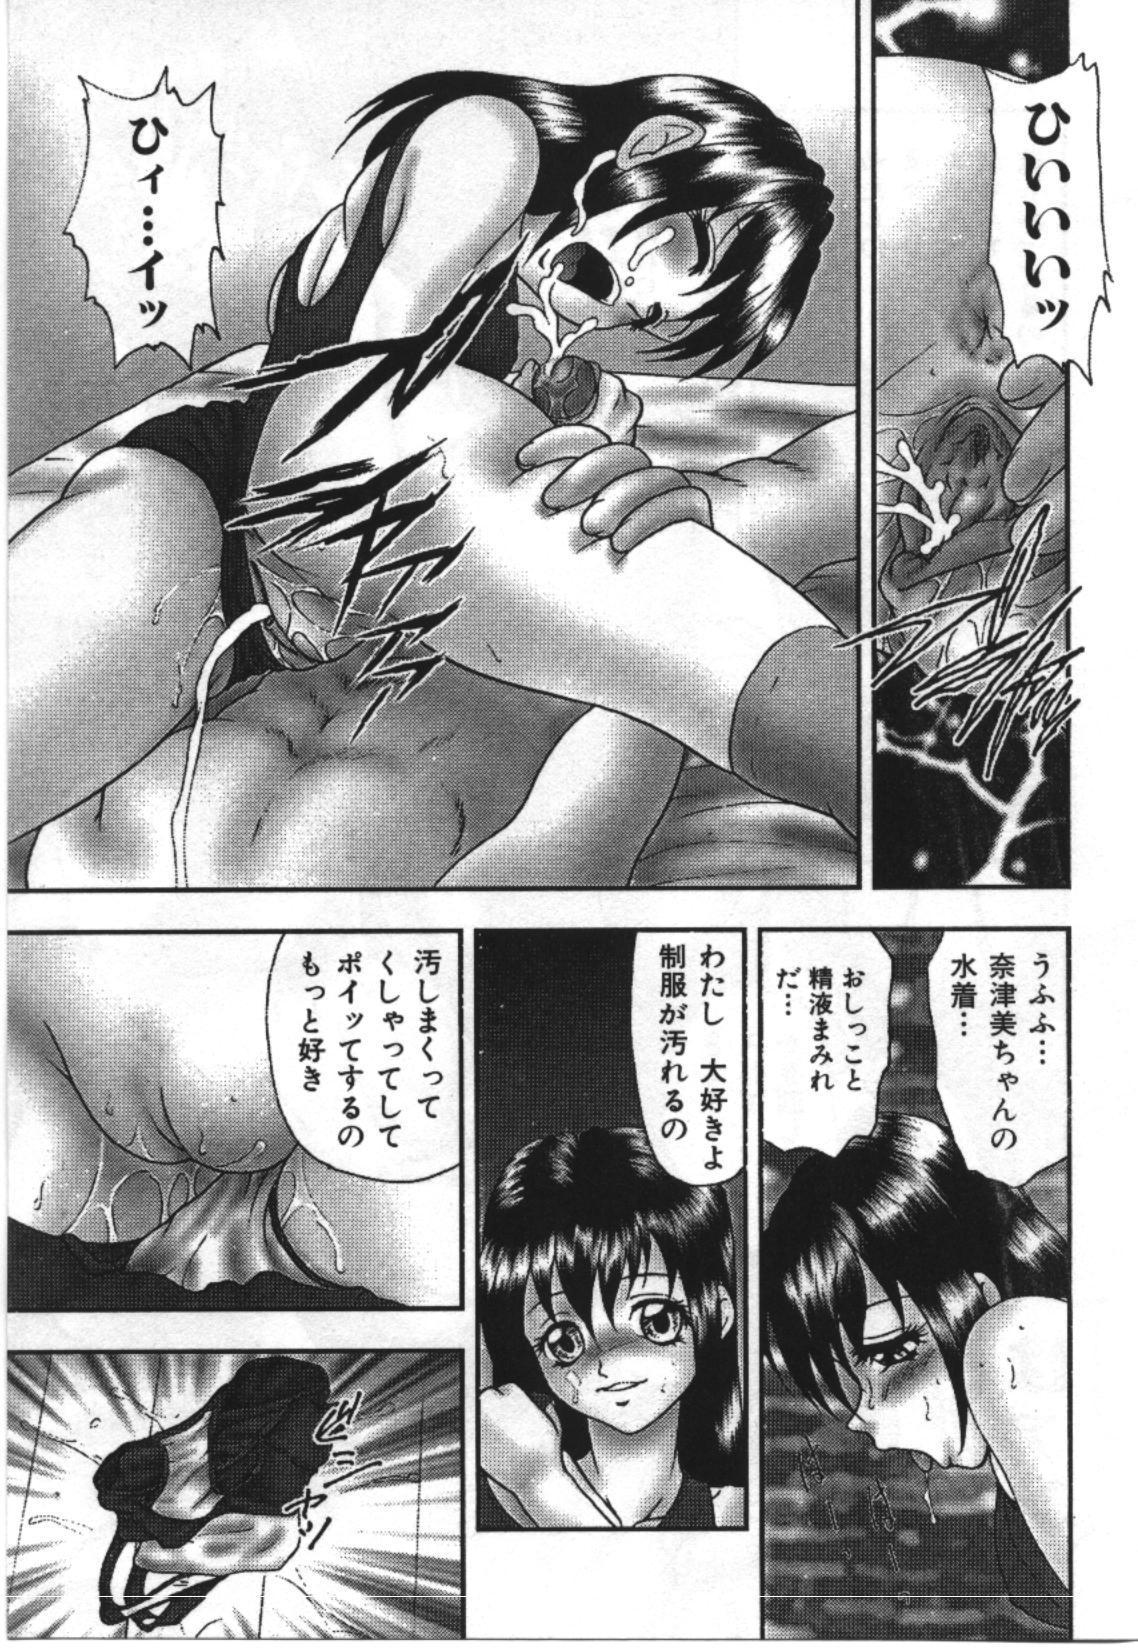 Imouto Koishi 2 76